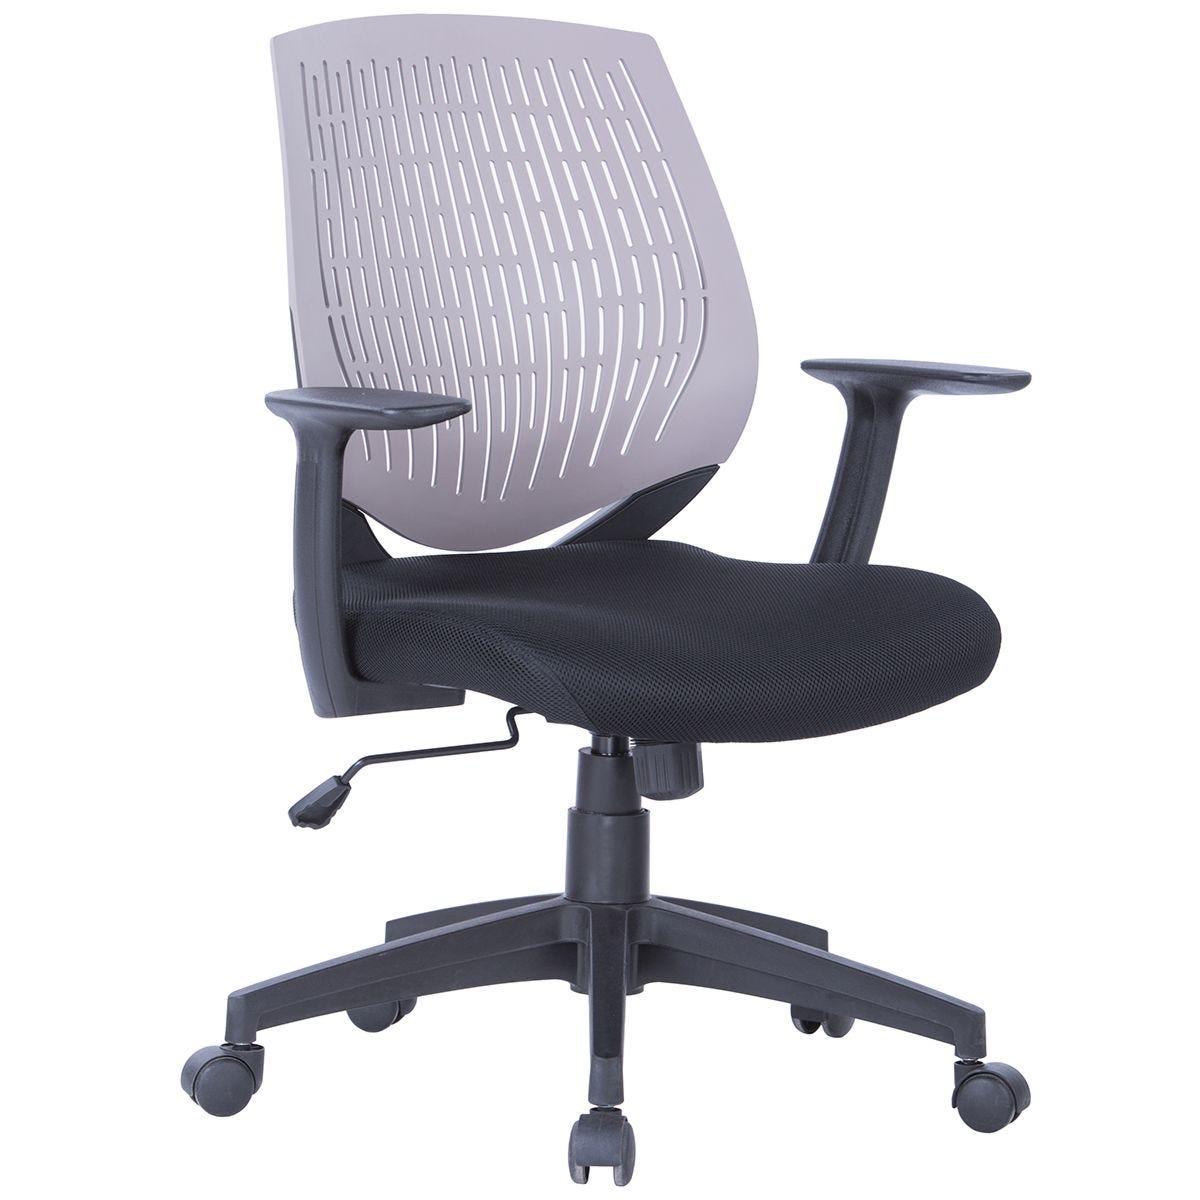 Alphason Malibu Chair - Grey